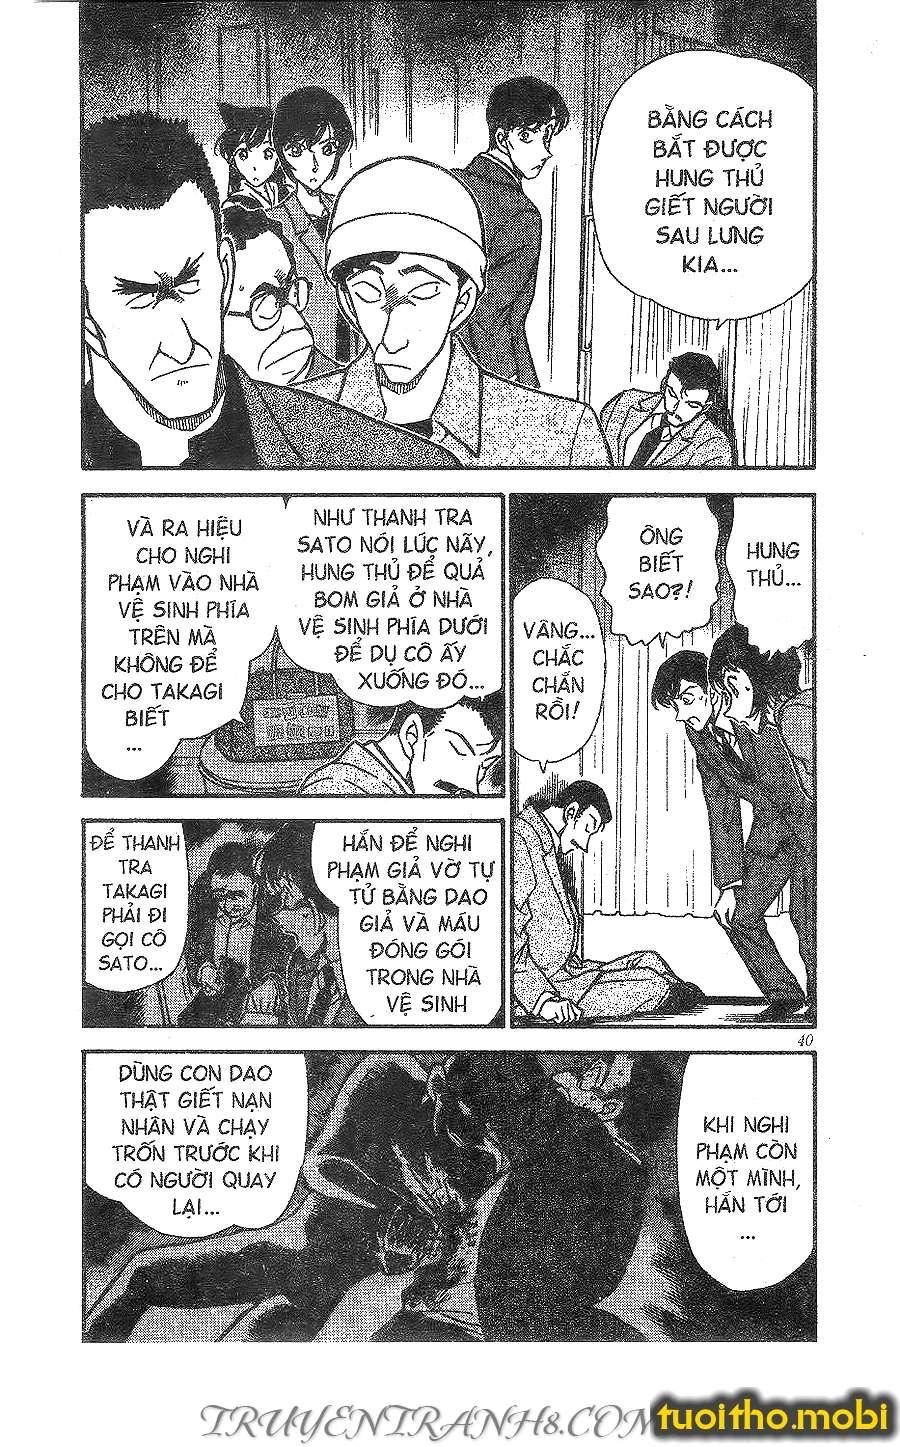 conan chương 298 trang 3